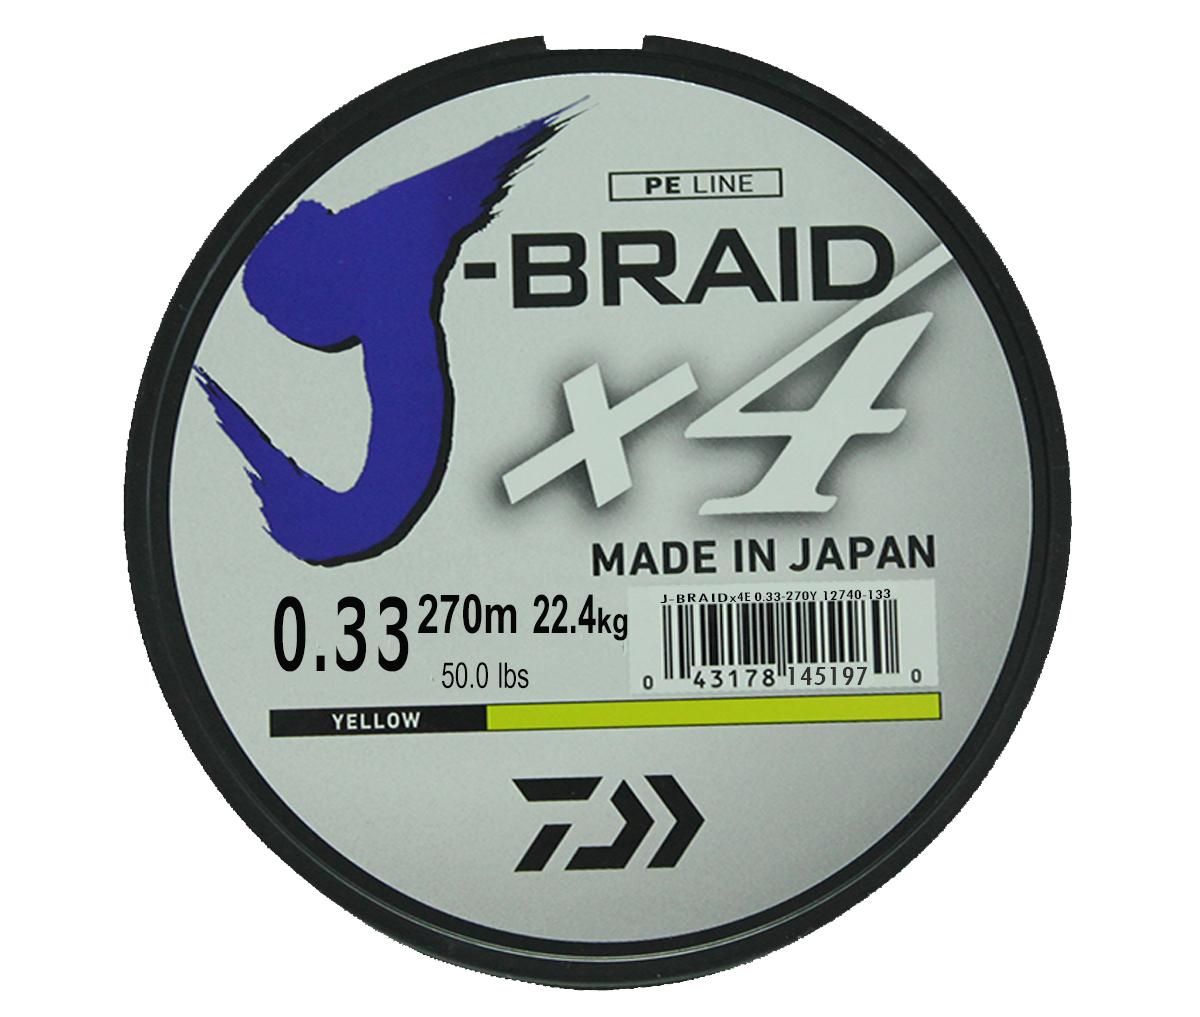 Шнур плетеный Daiwa J-Braid X4, цвет: флуоресцентный желтый, 270 м, 0,33 мм